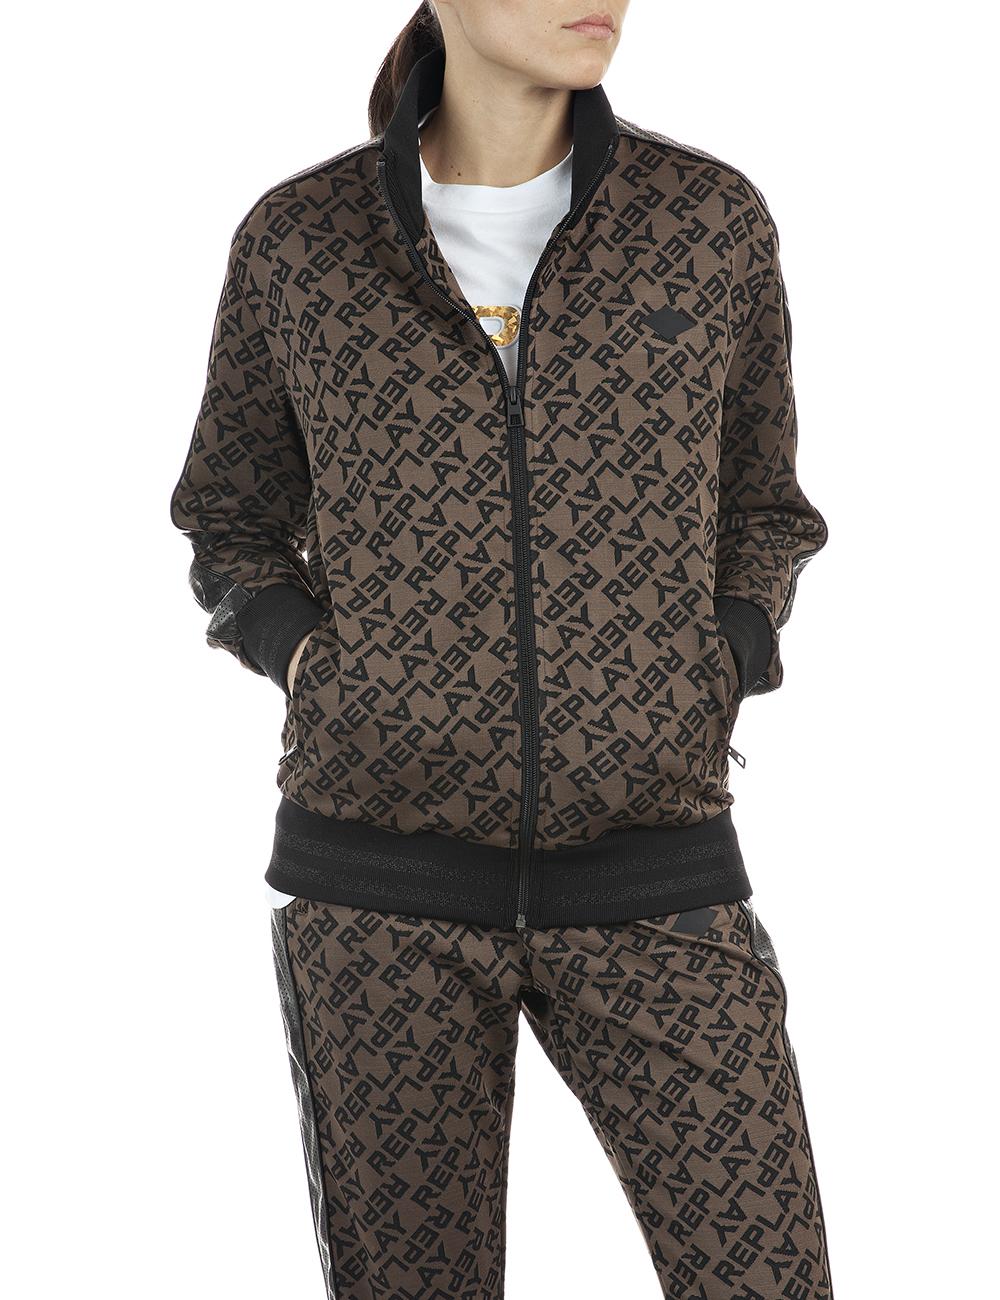 REPLAY | Brown&Black jacquard logo tech fleece Sweatshirt